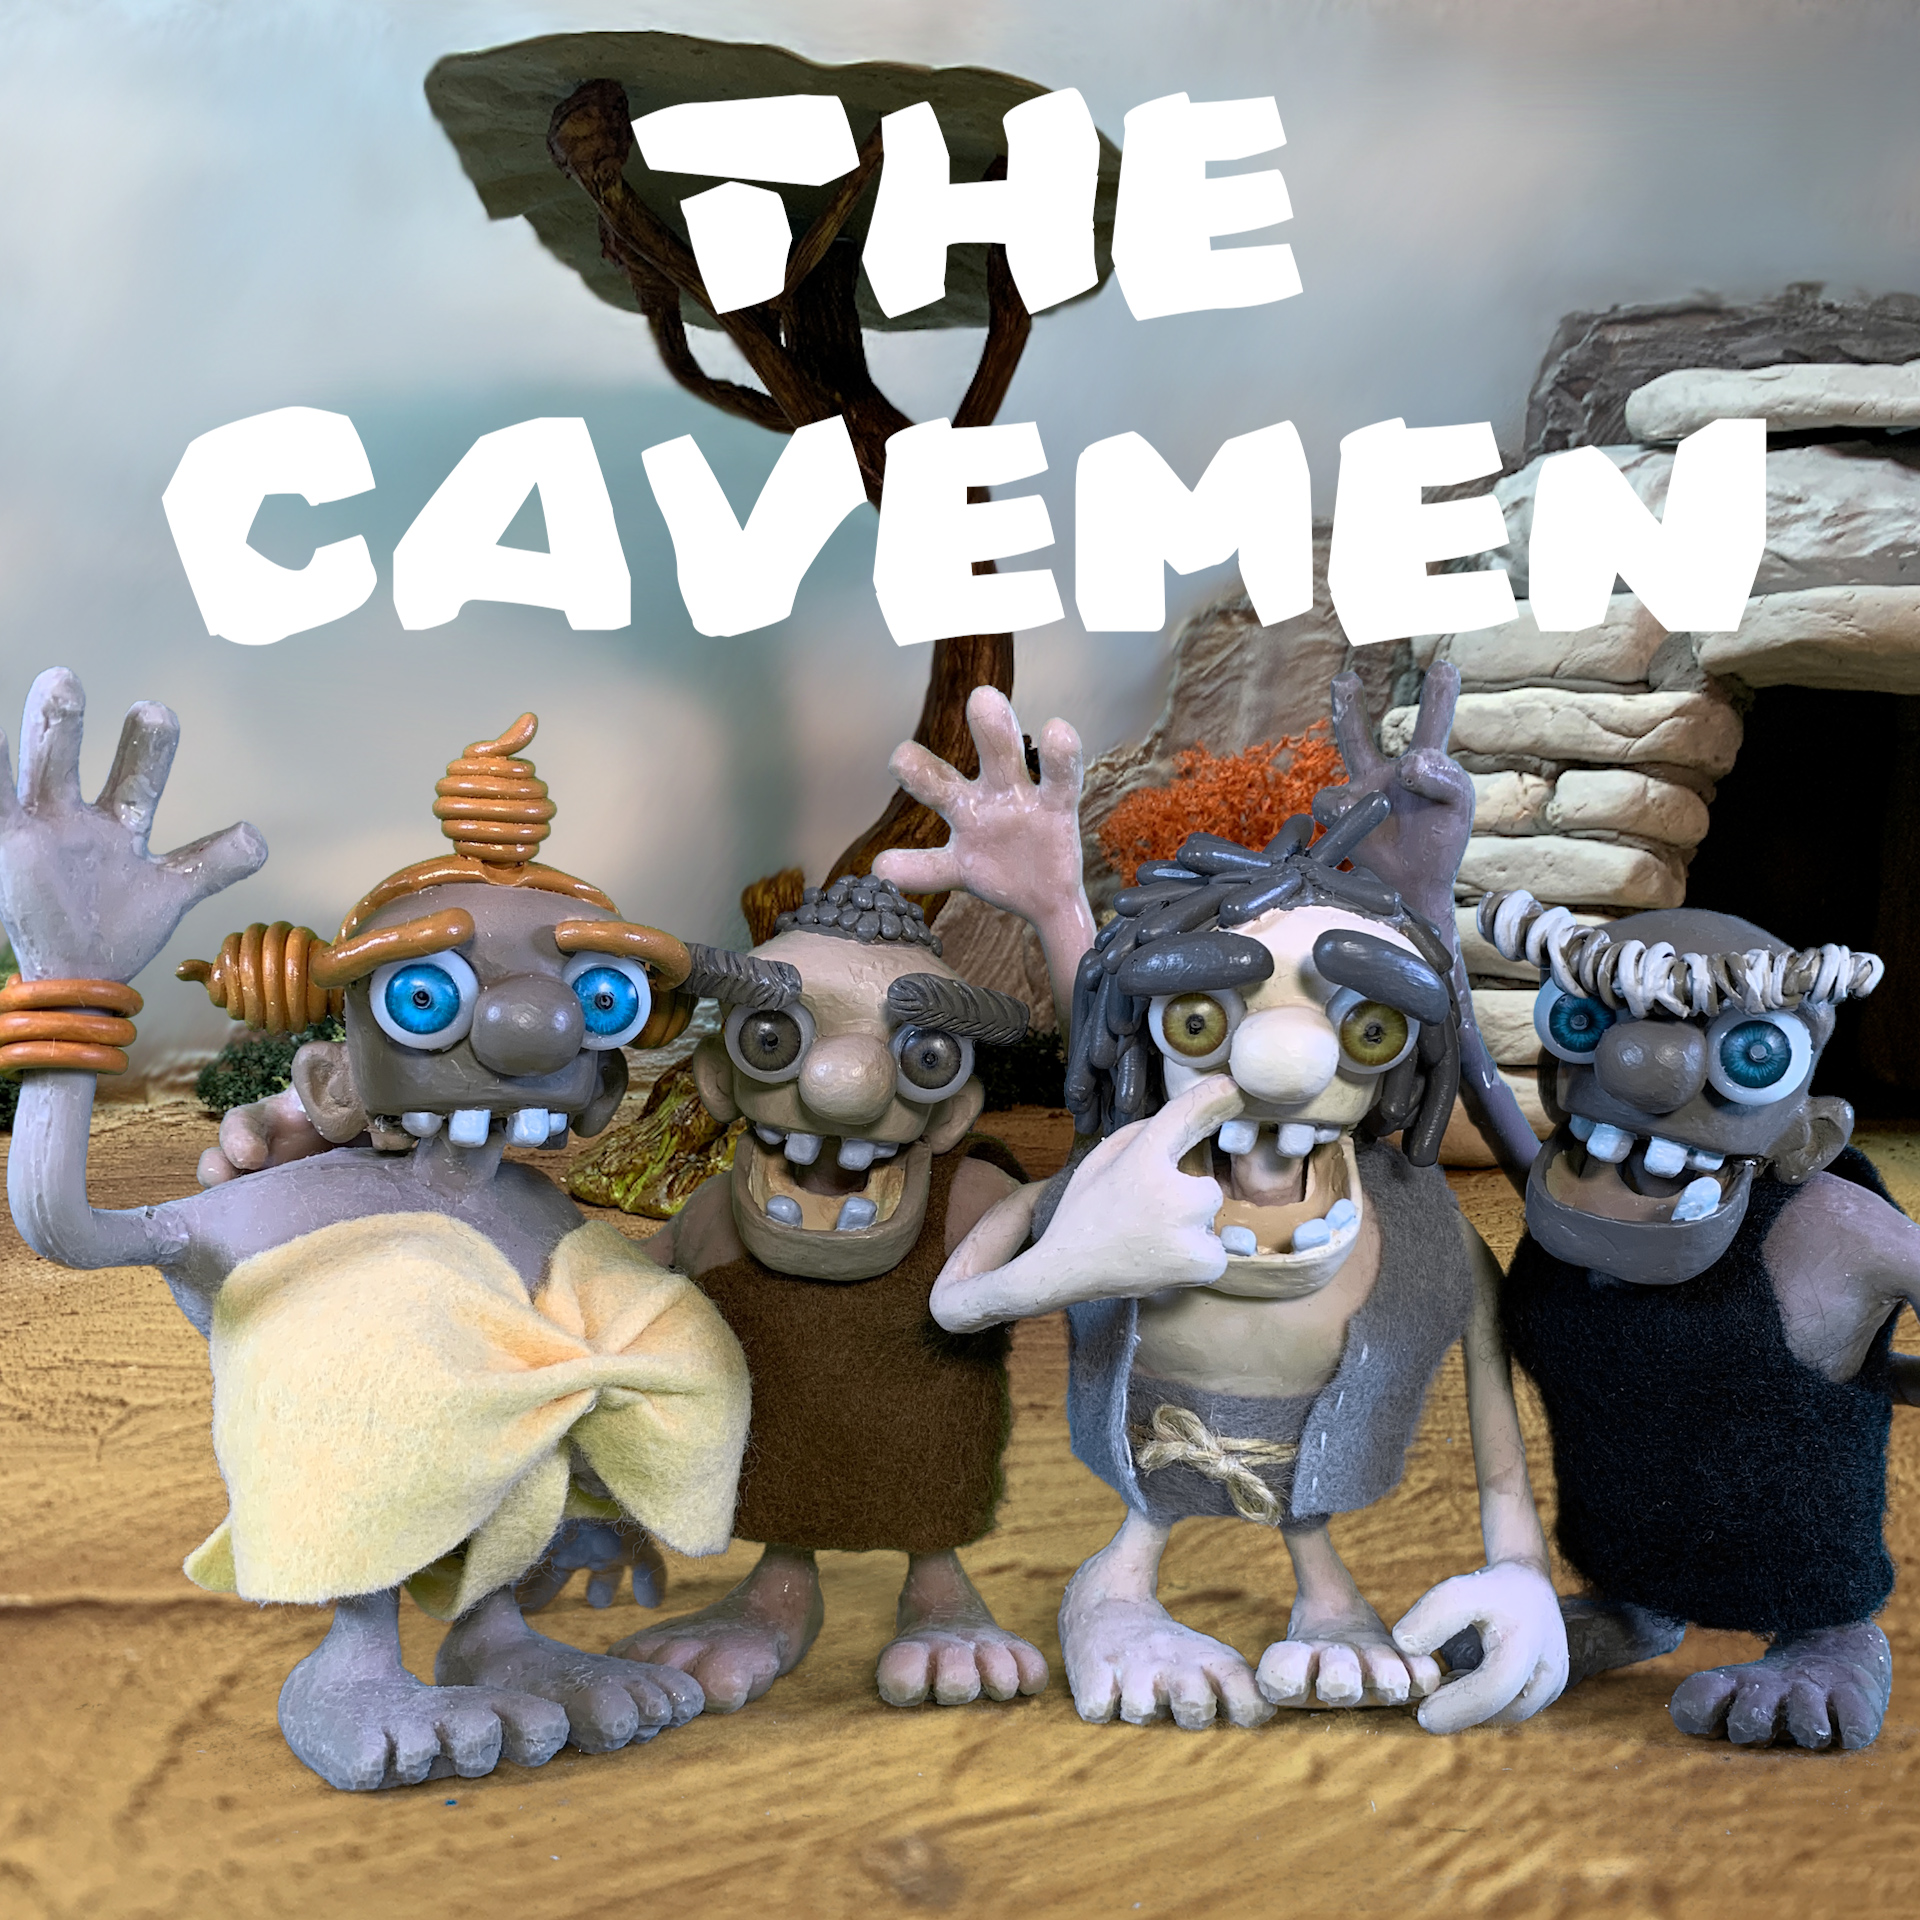 didwastudio/the-cavemen